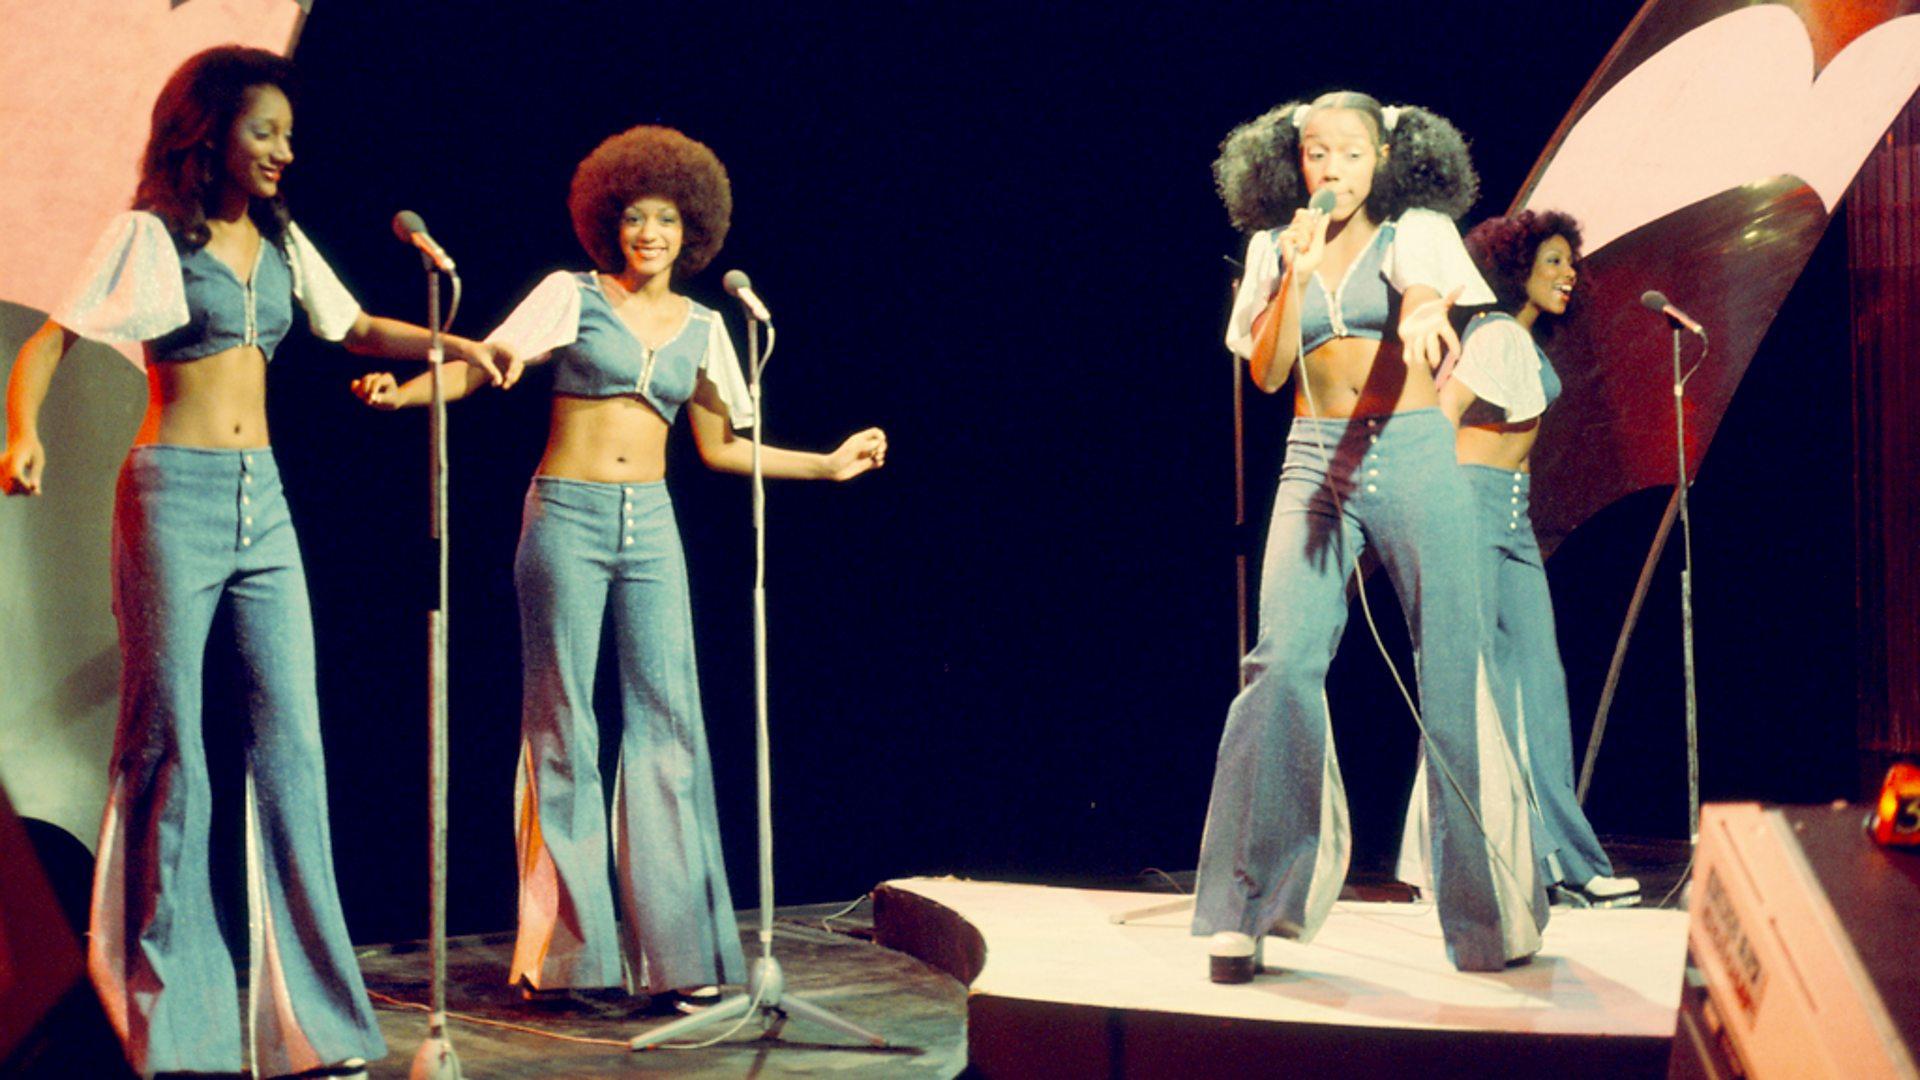 62a47d24aeb BBC - 6 ways disco changed the world